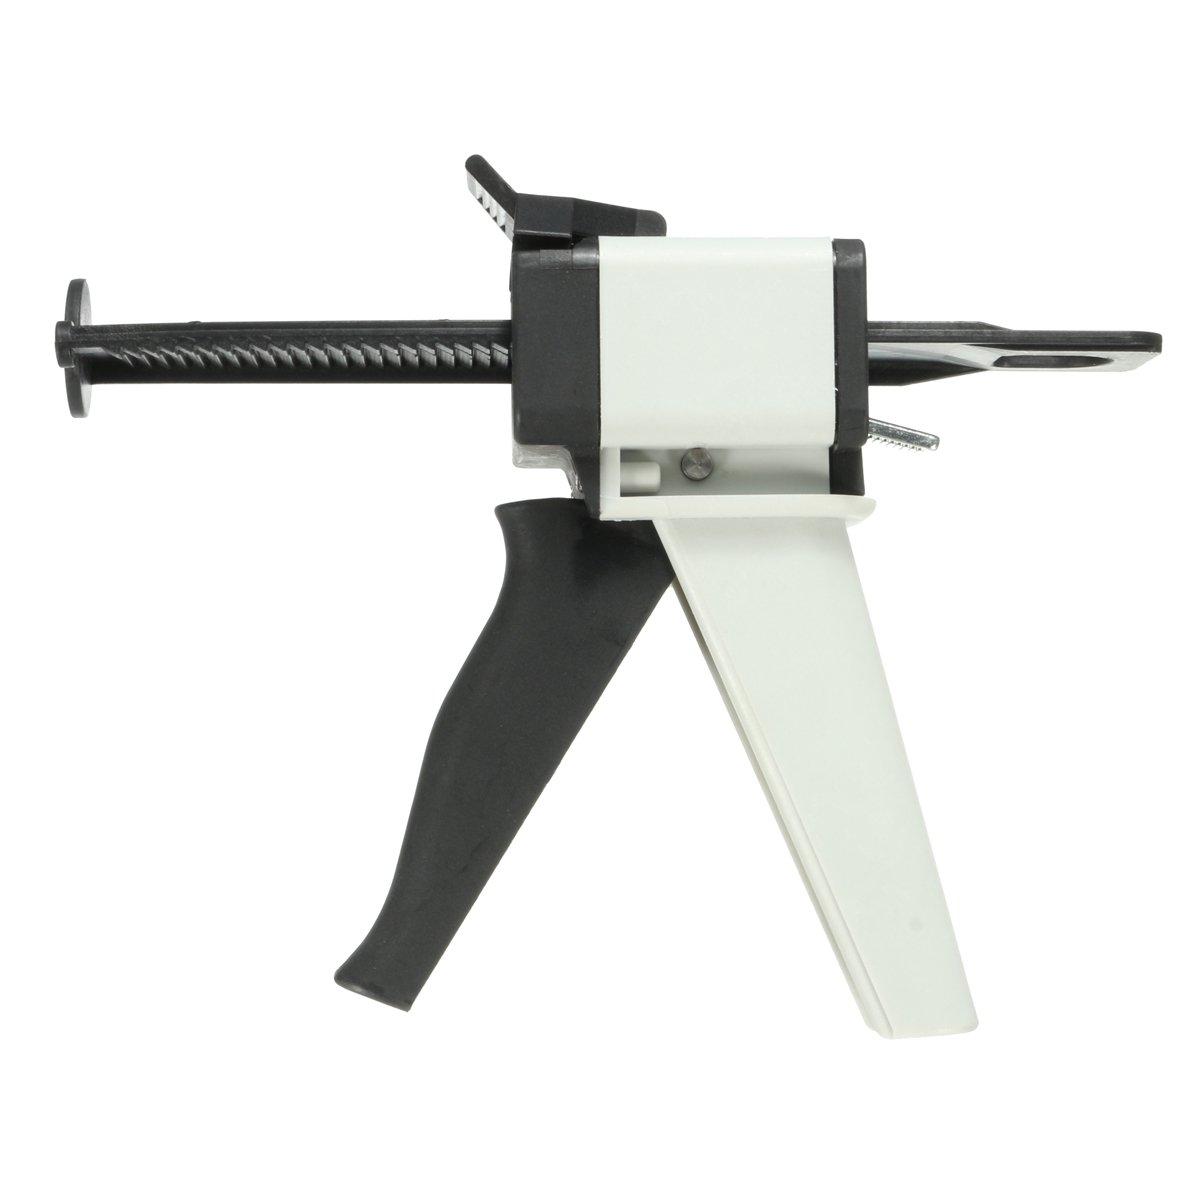 QOJA dispenser gun impression mixing dispensing gun 10:1 impression